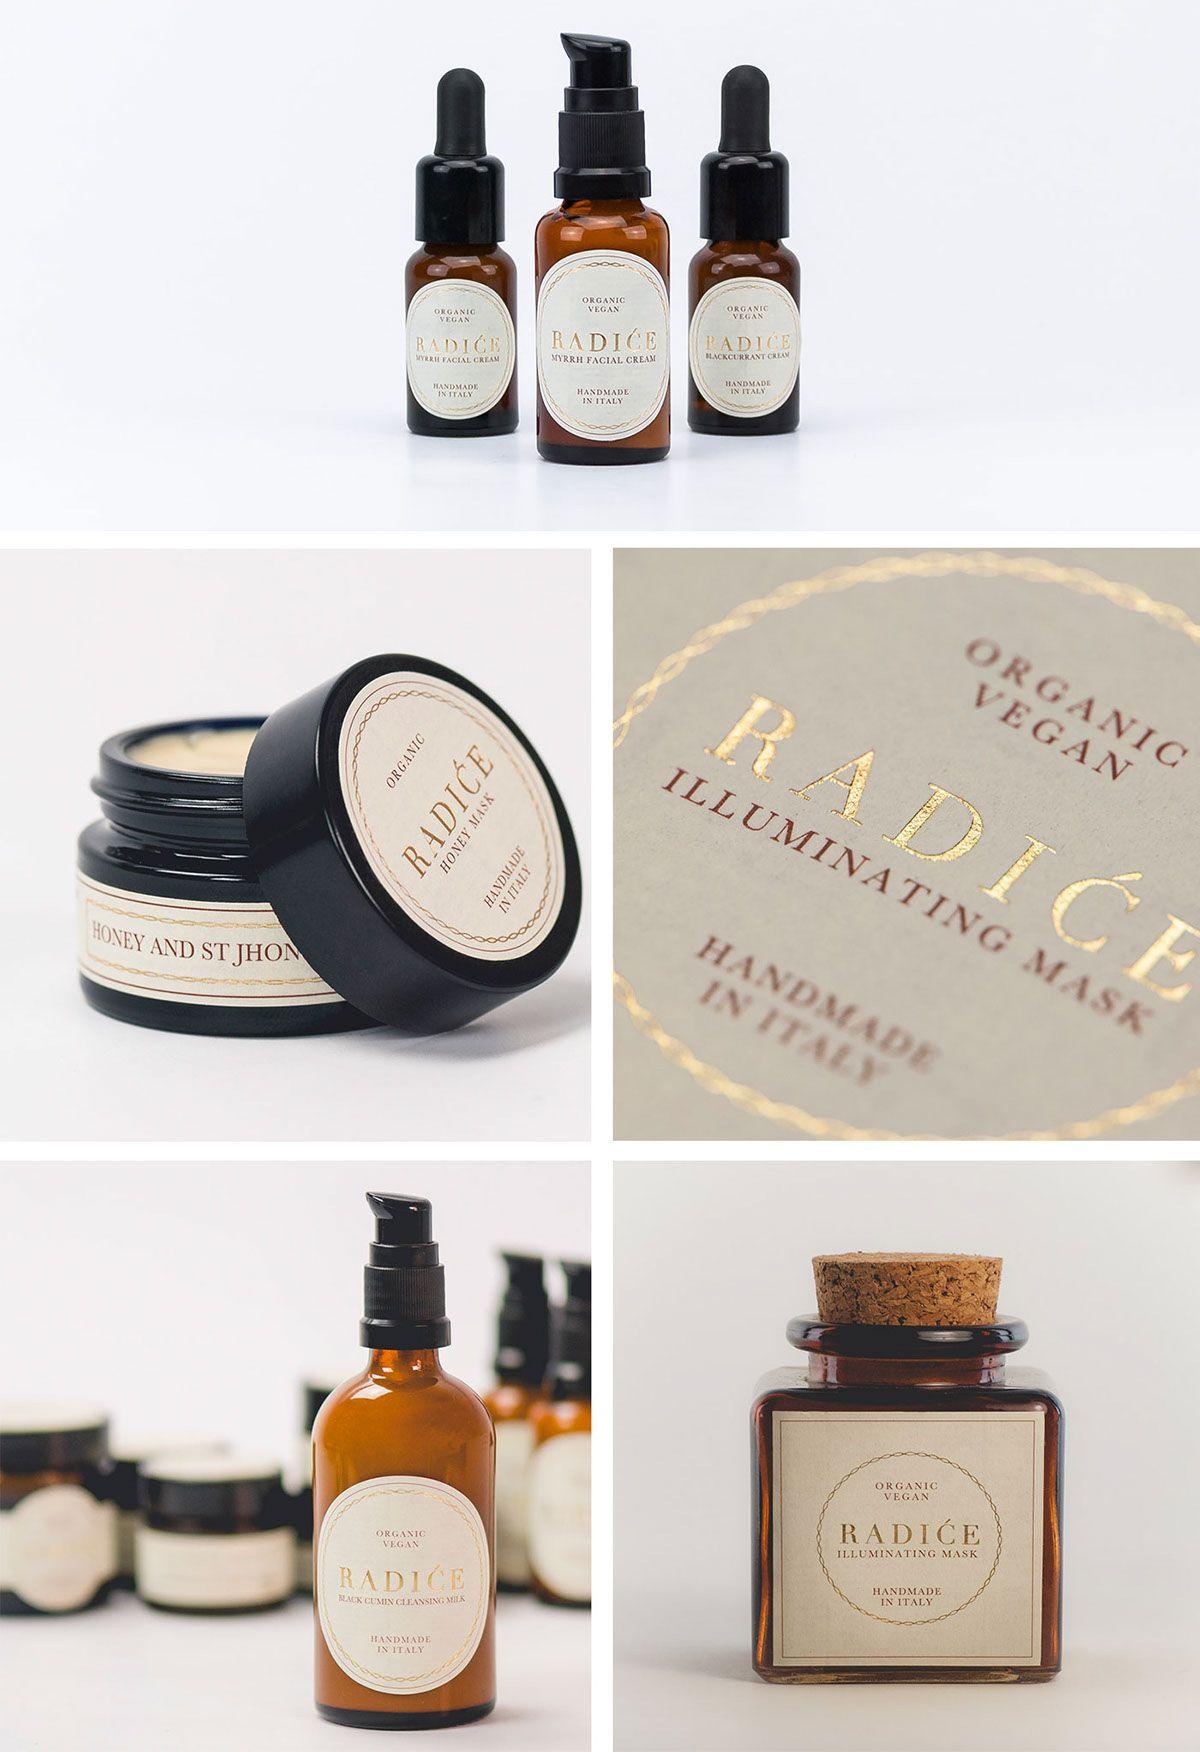 Radiće Organic / Vegan Cosmetics on Behance (With images